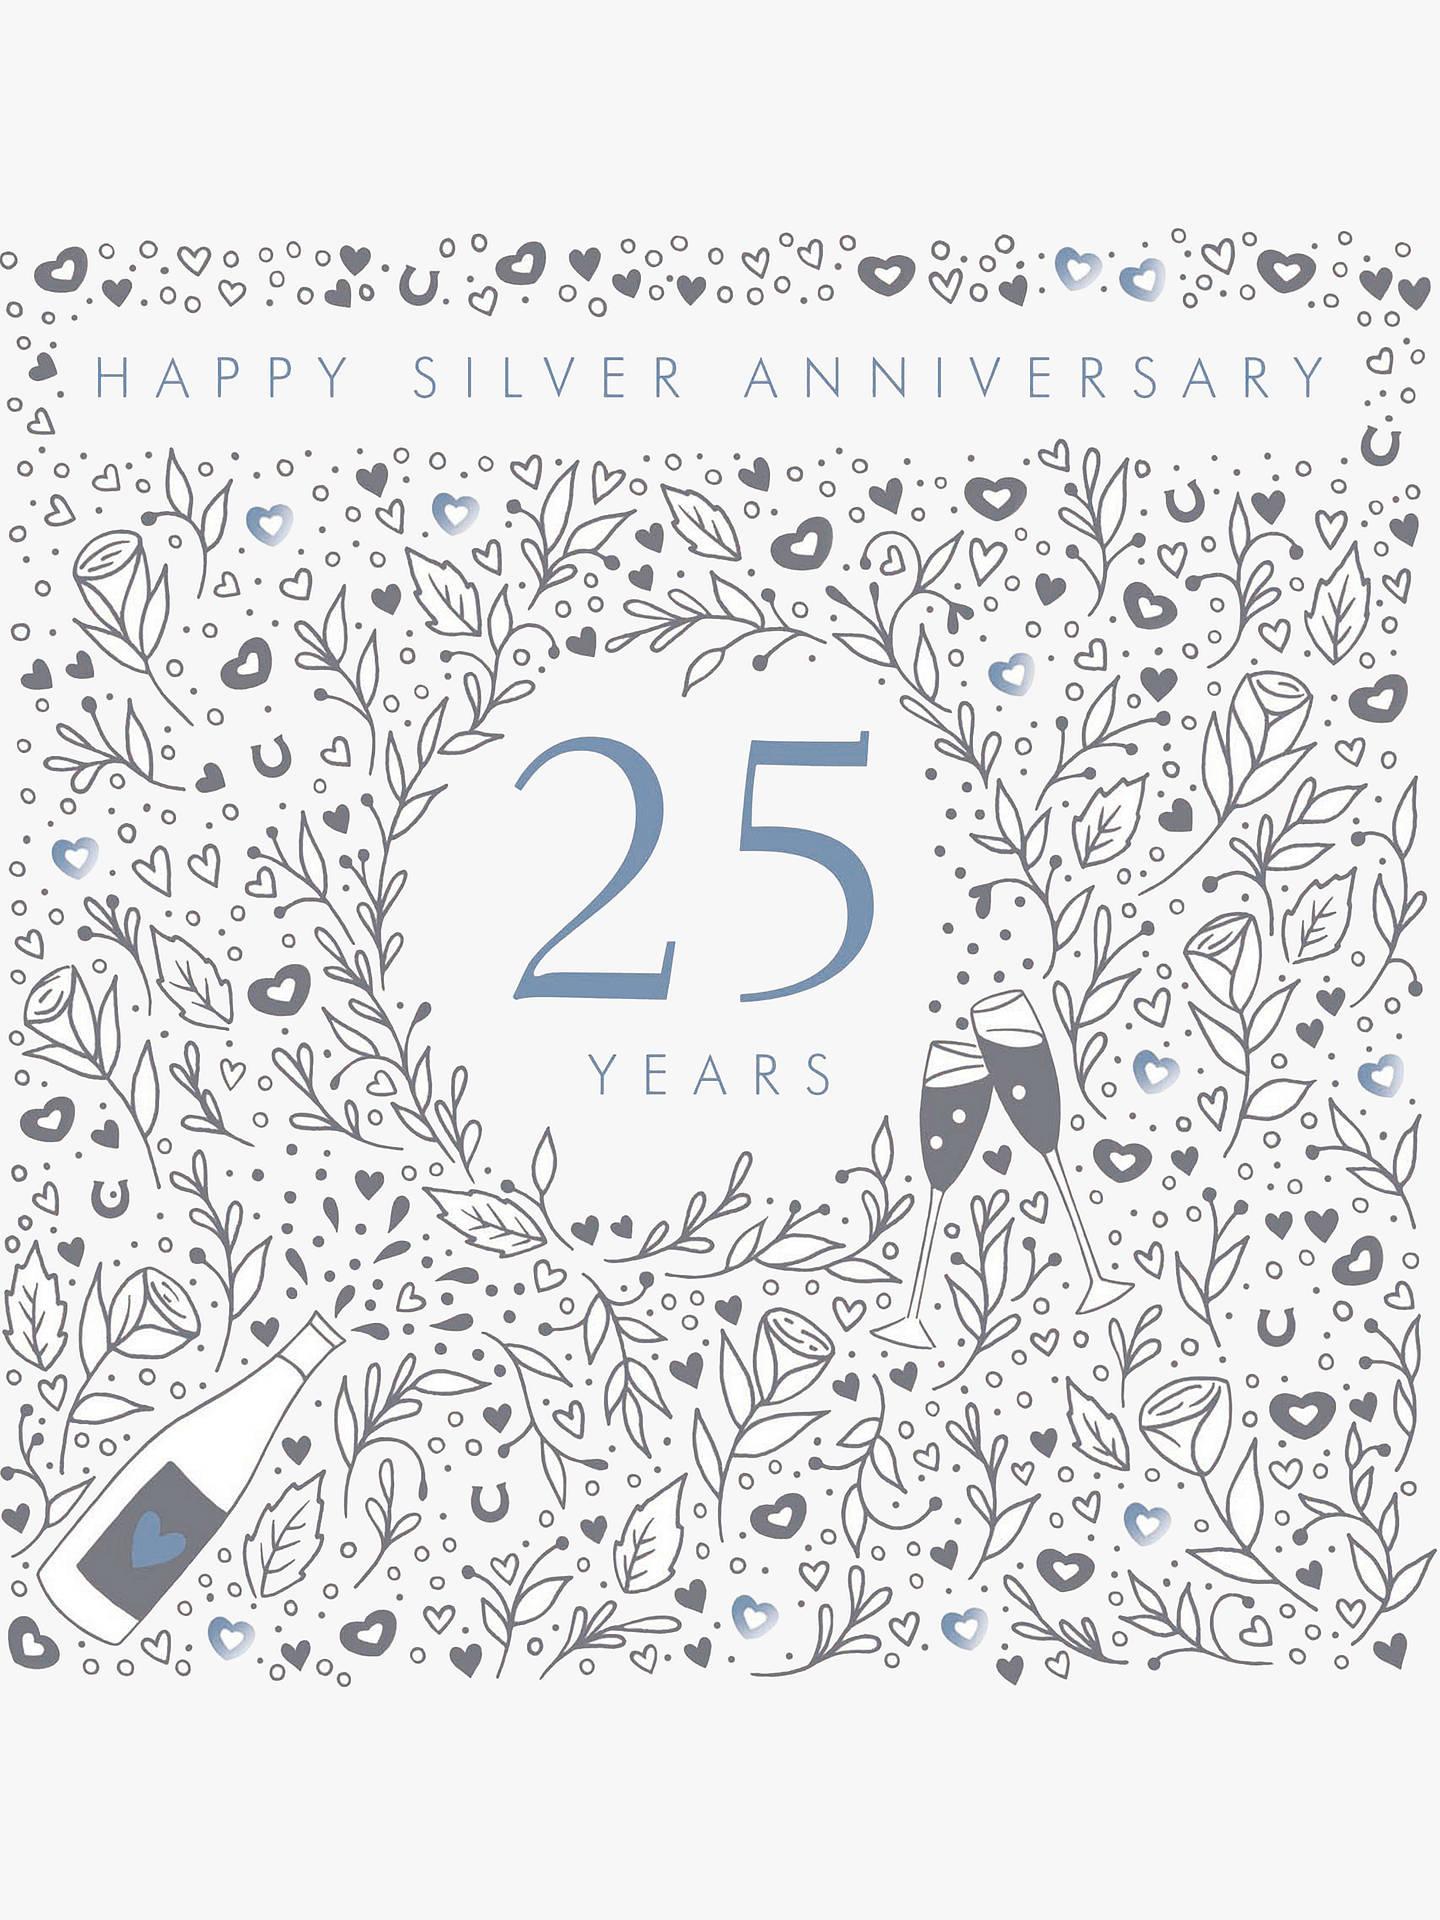 Woodmansterne 25th Silver Wedding Anniversary Card Online At Johnlewis